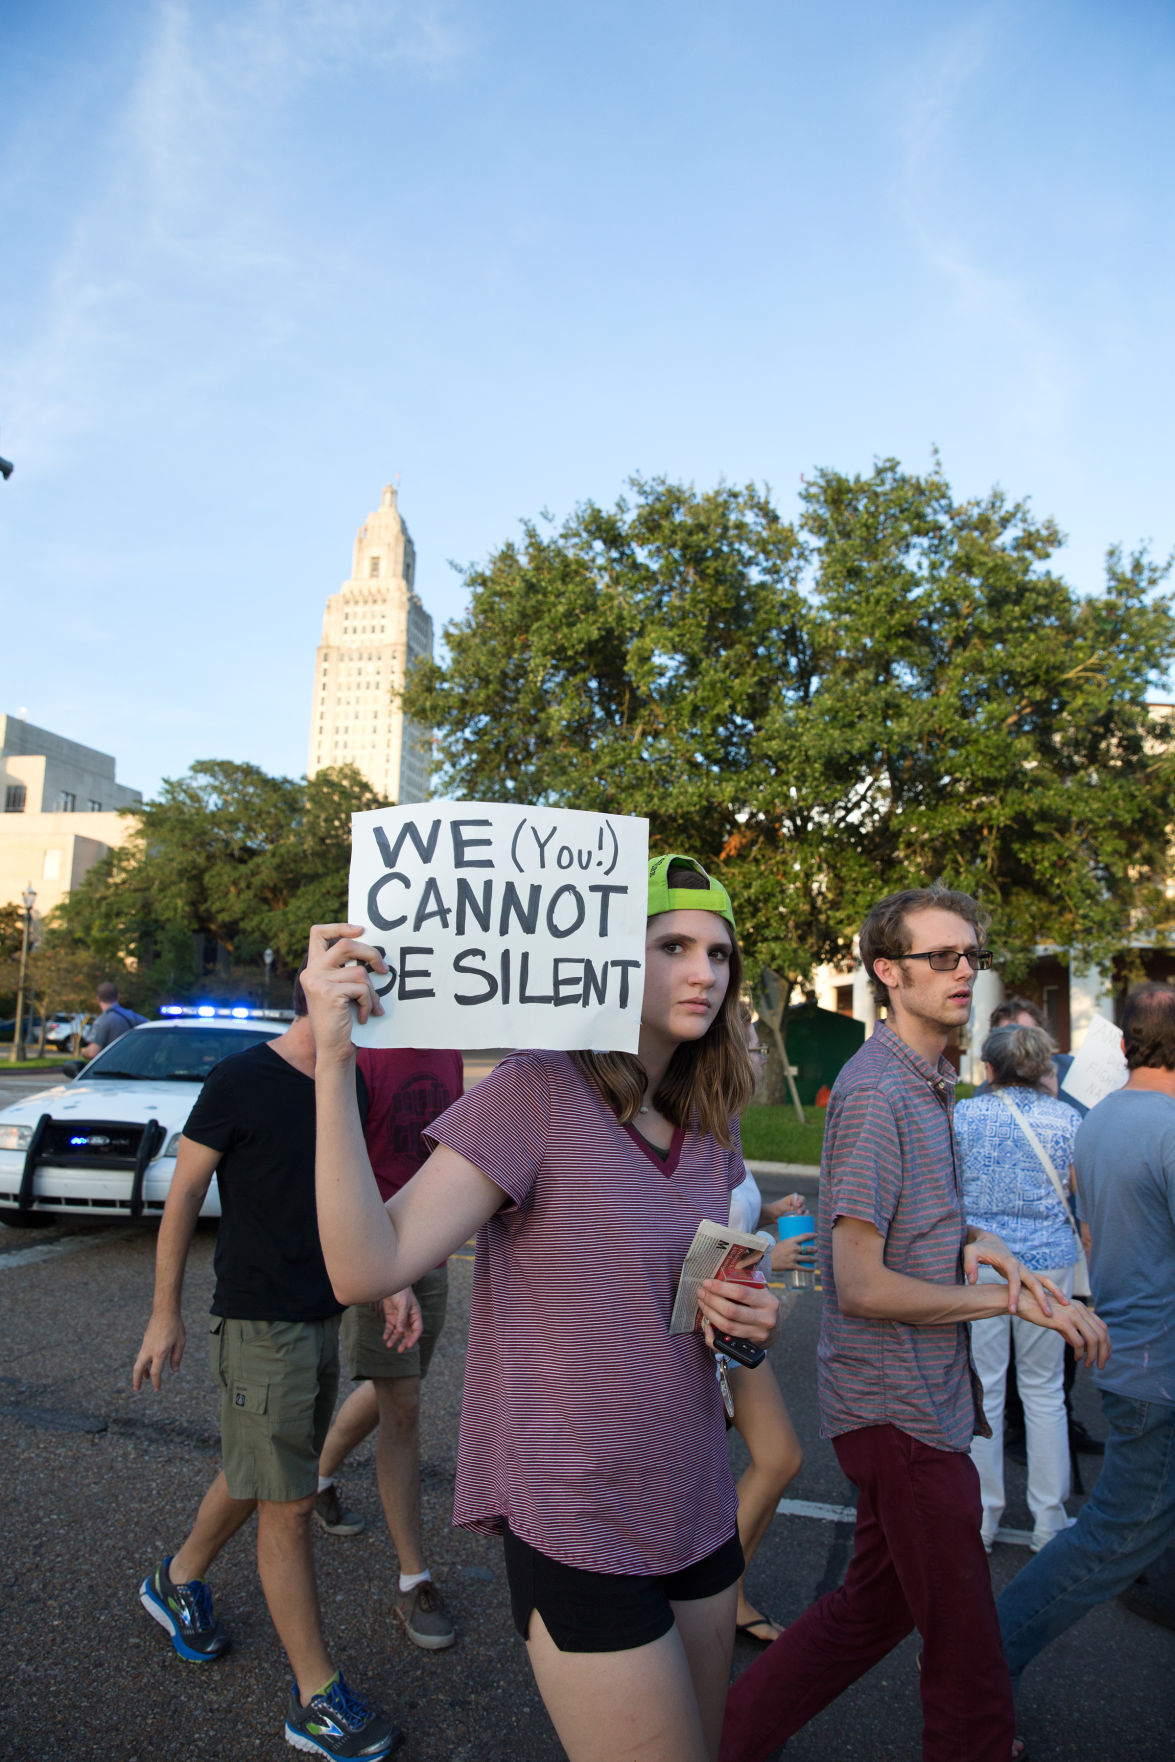 BR.protest.006.081417.jpg